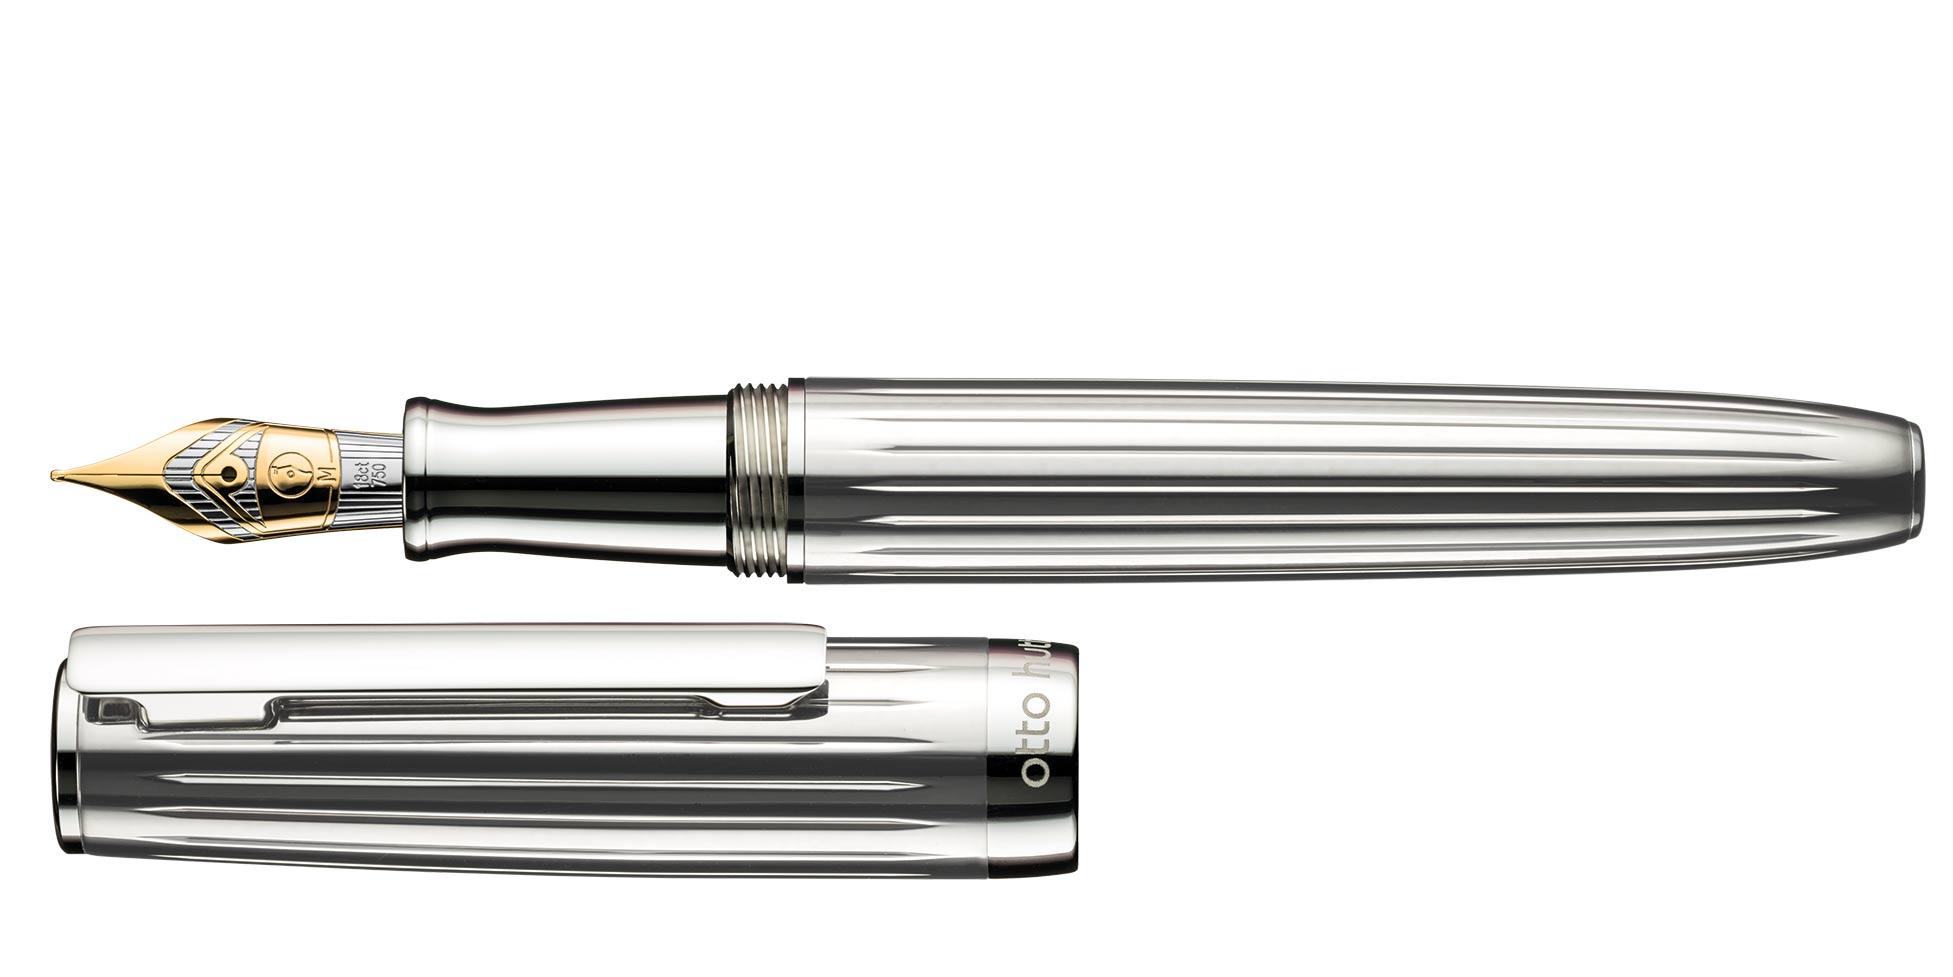 cuerpo y tapa Bol/ígrafo de punta redonda Otto Hutt Design 02 plata de ley 925